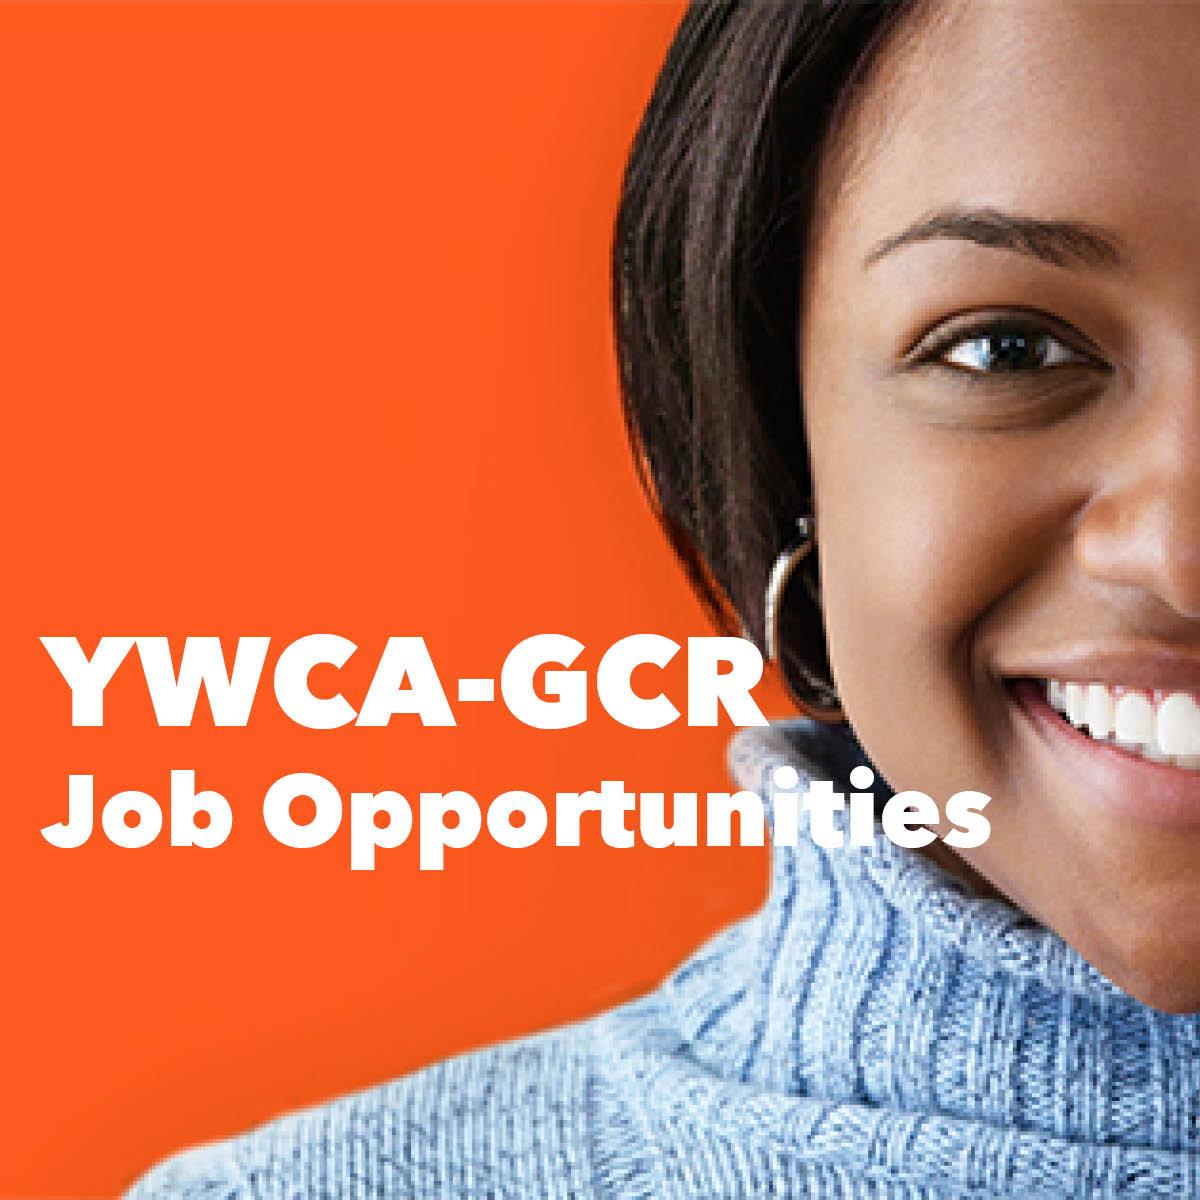 Job Opportunities thumb.jpg